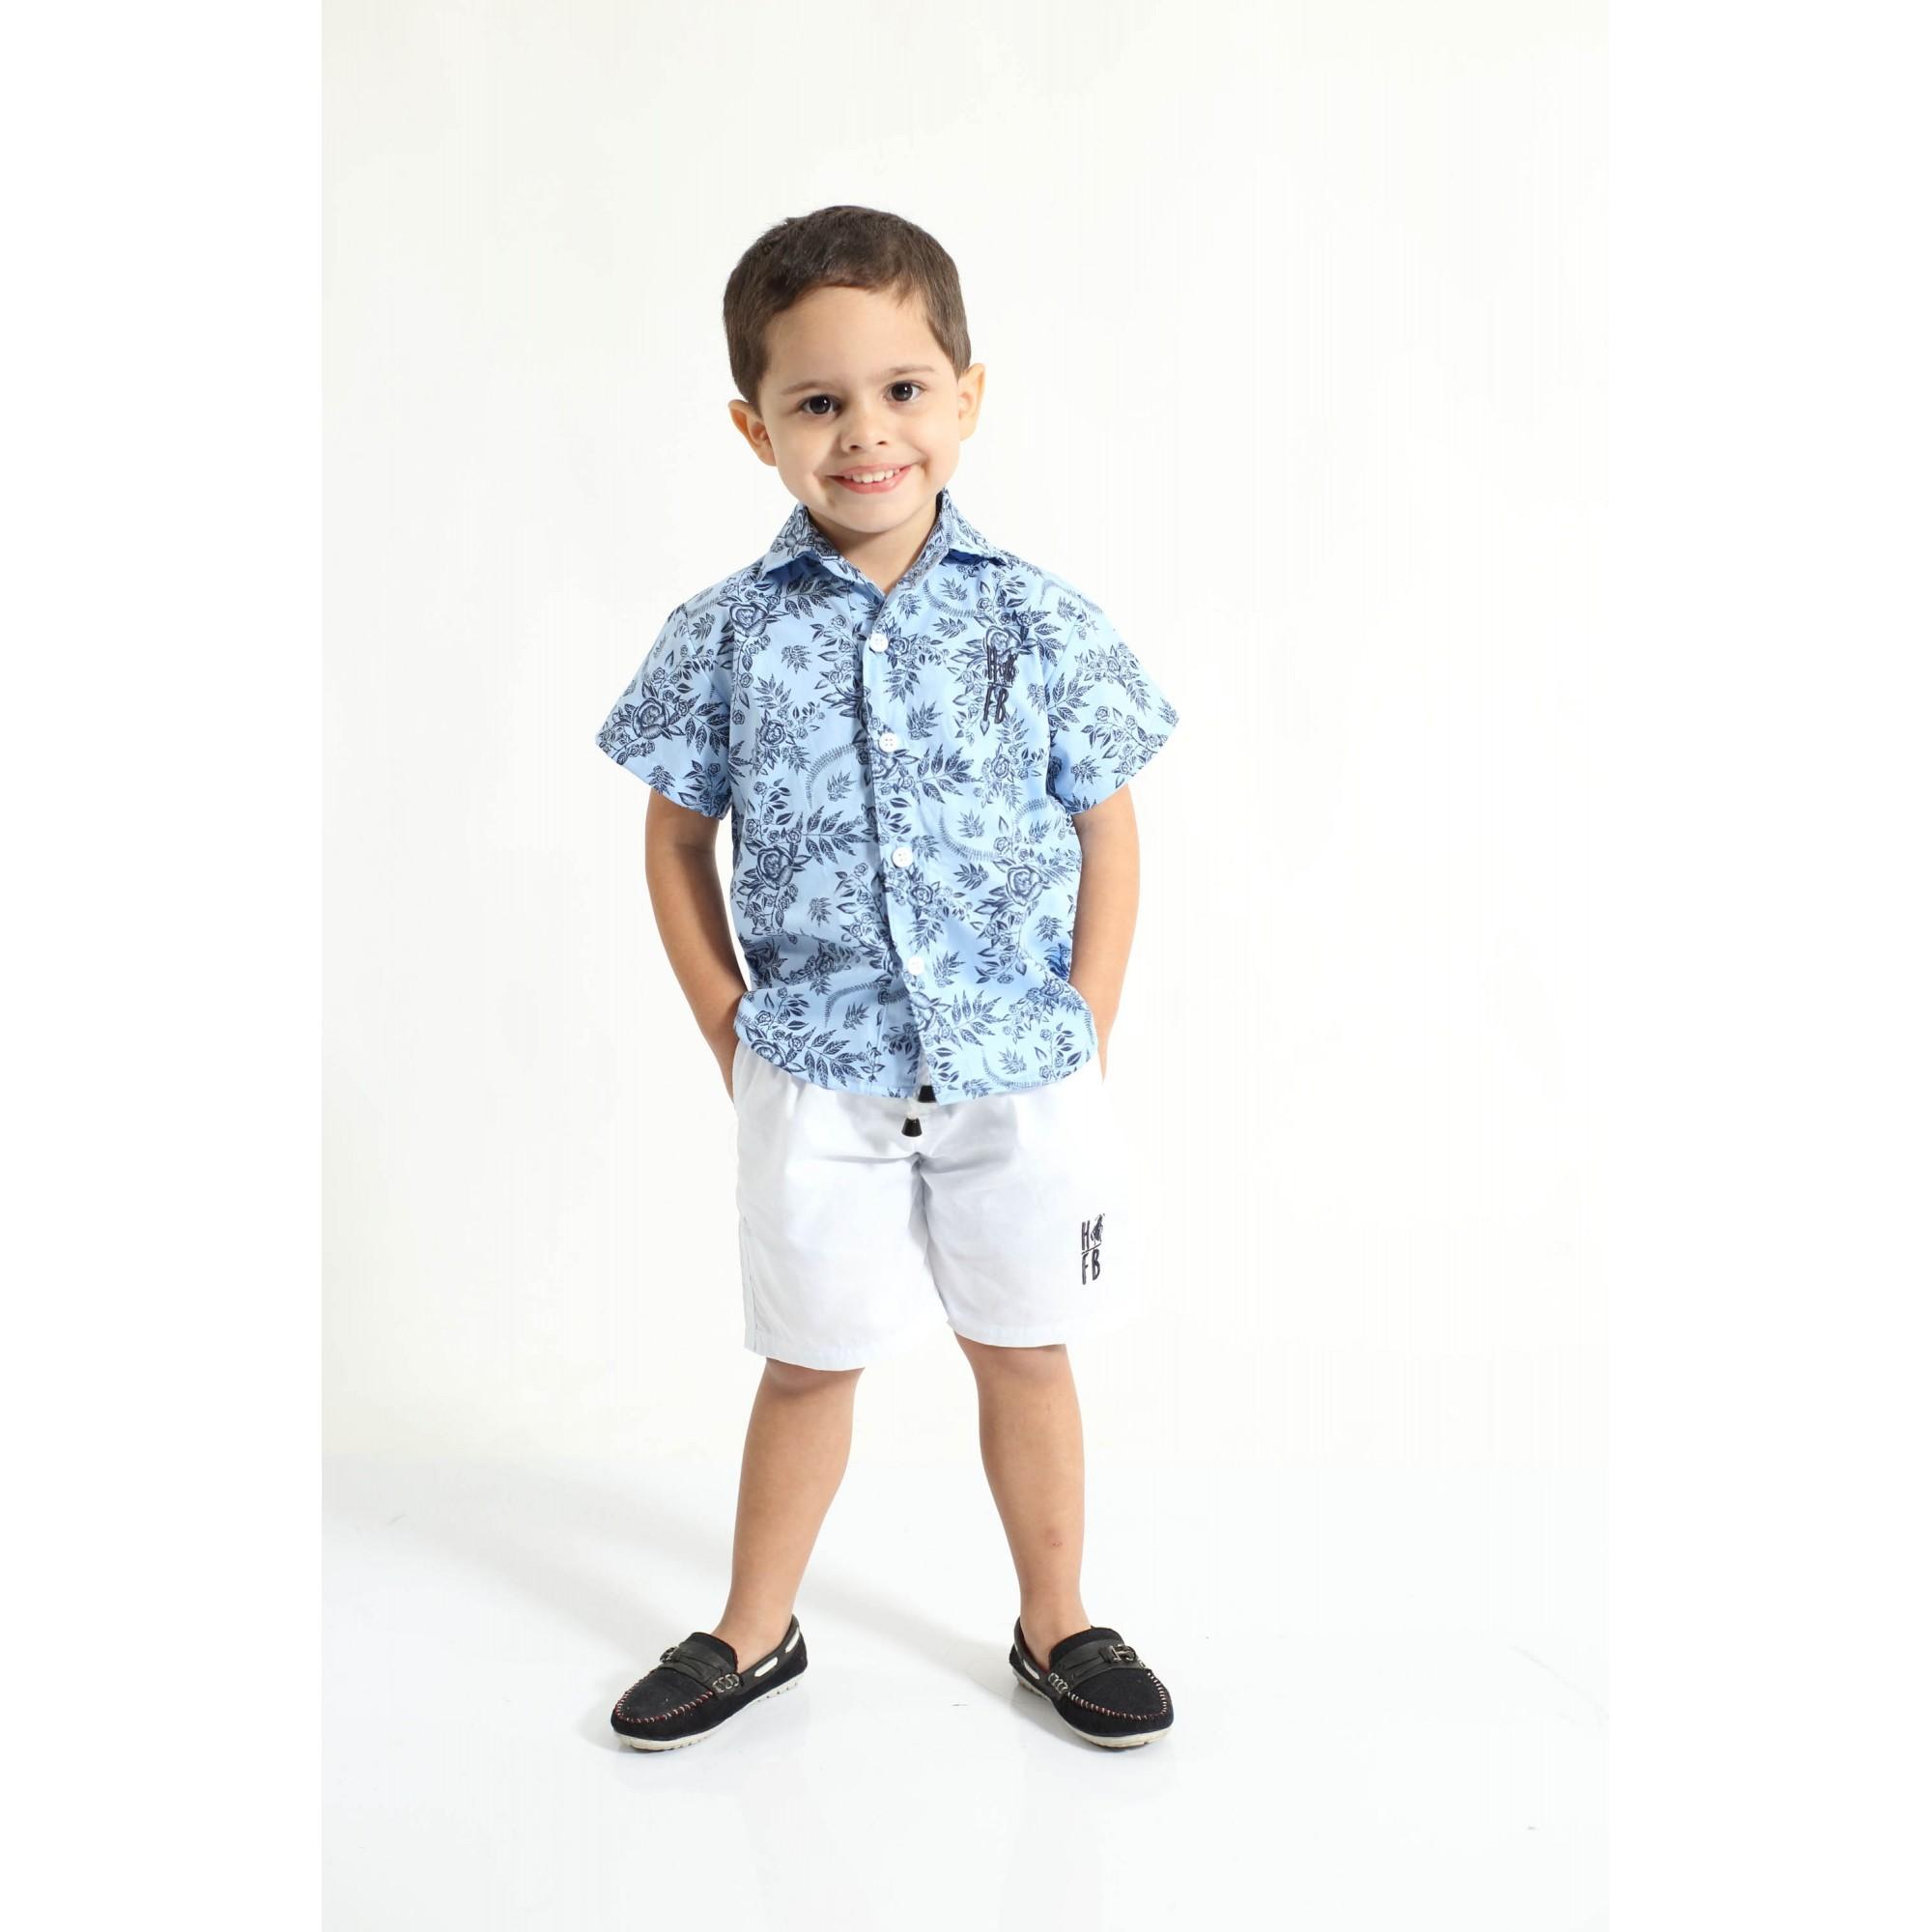 Camisa Social Manga Curta Azul Floral Infantil  - Heitor Fashion Brazil